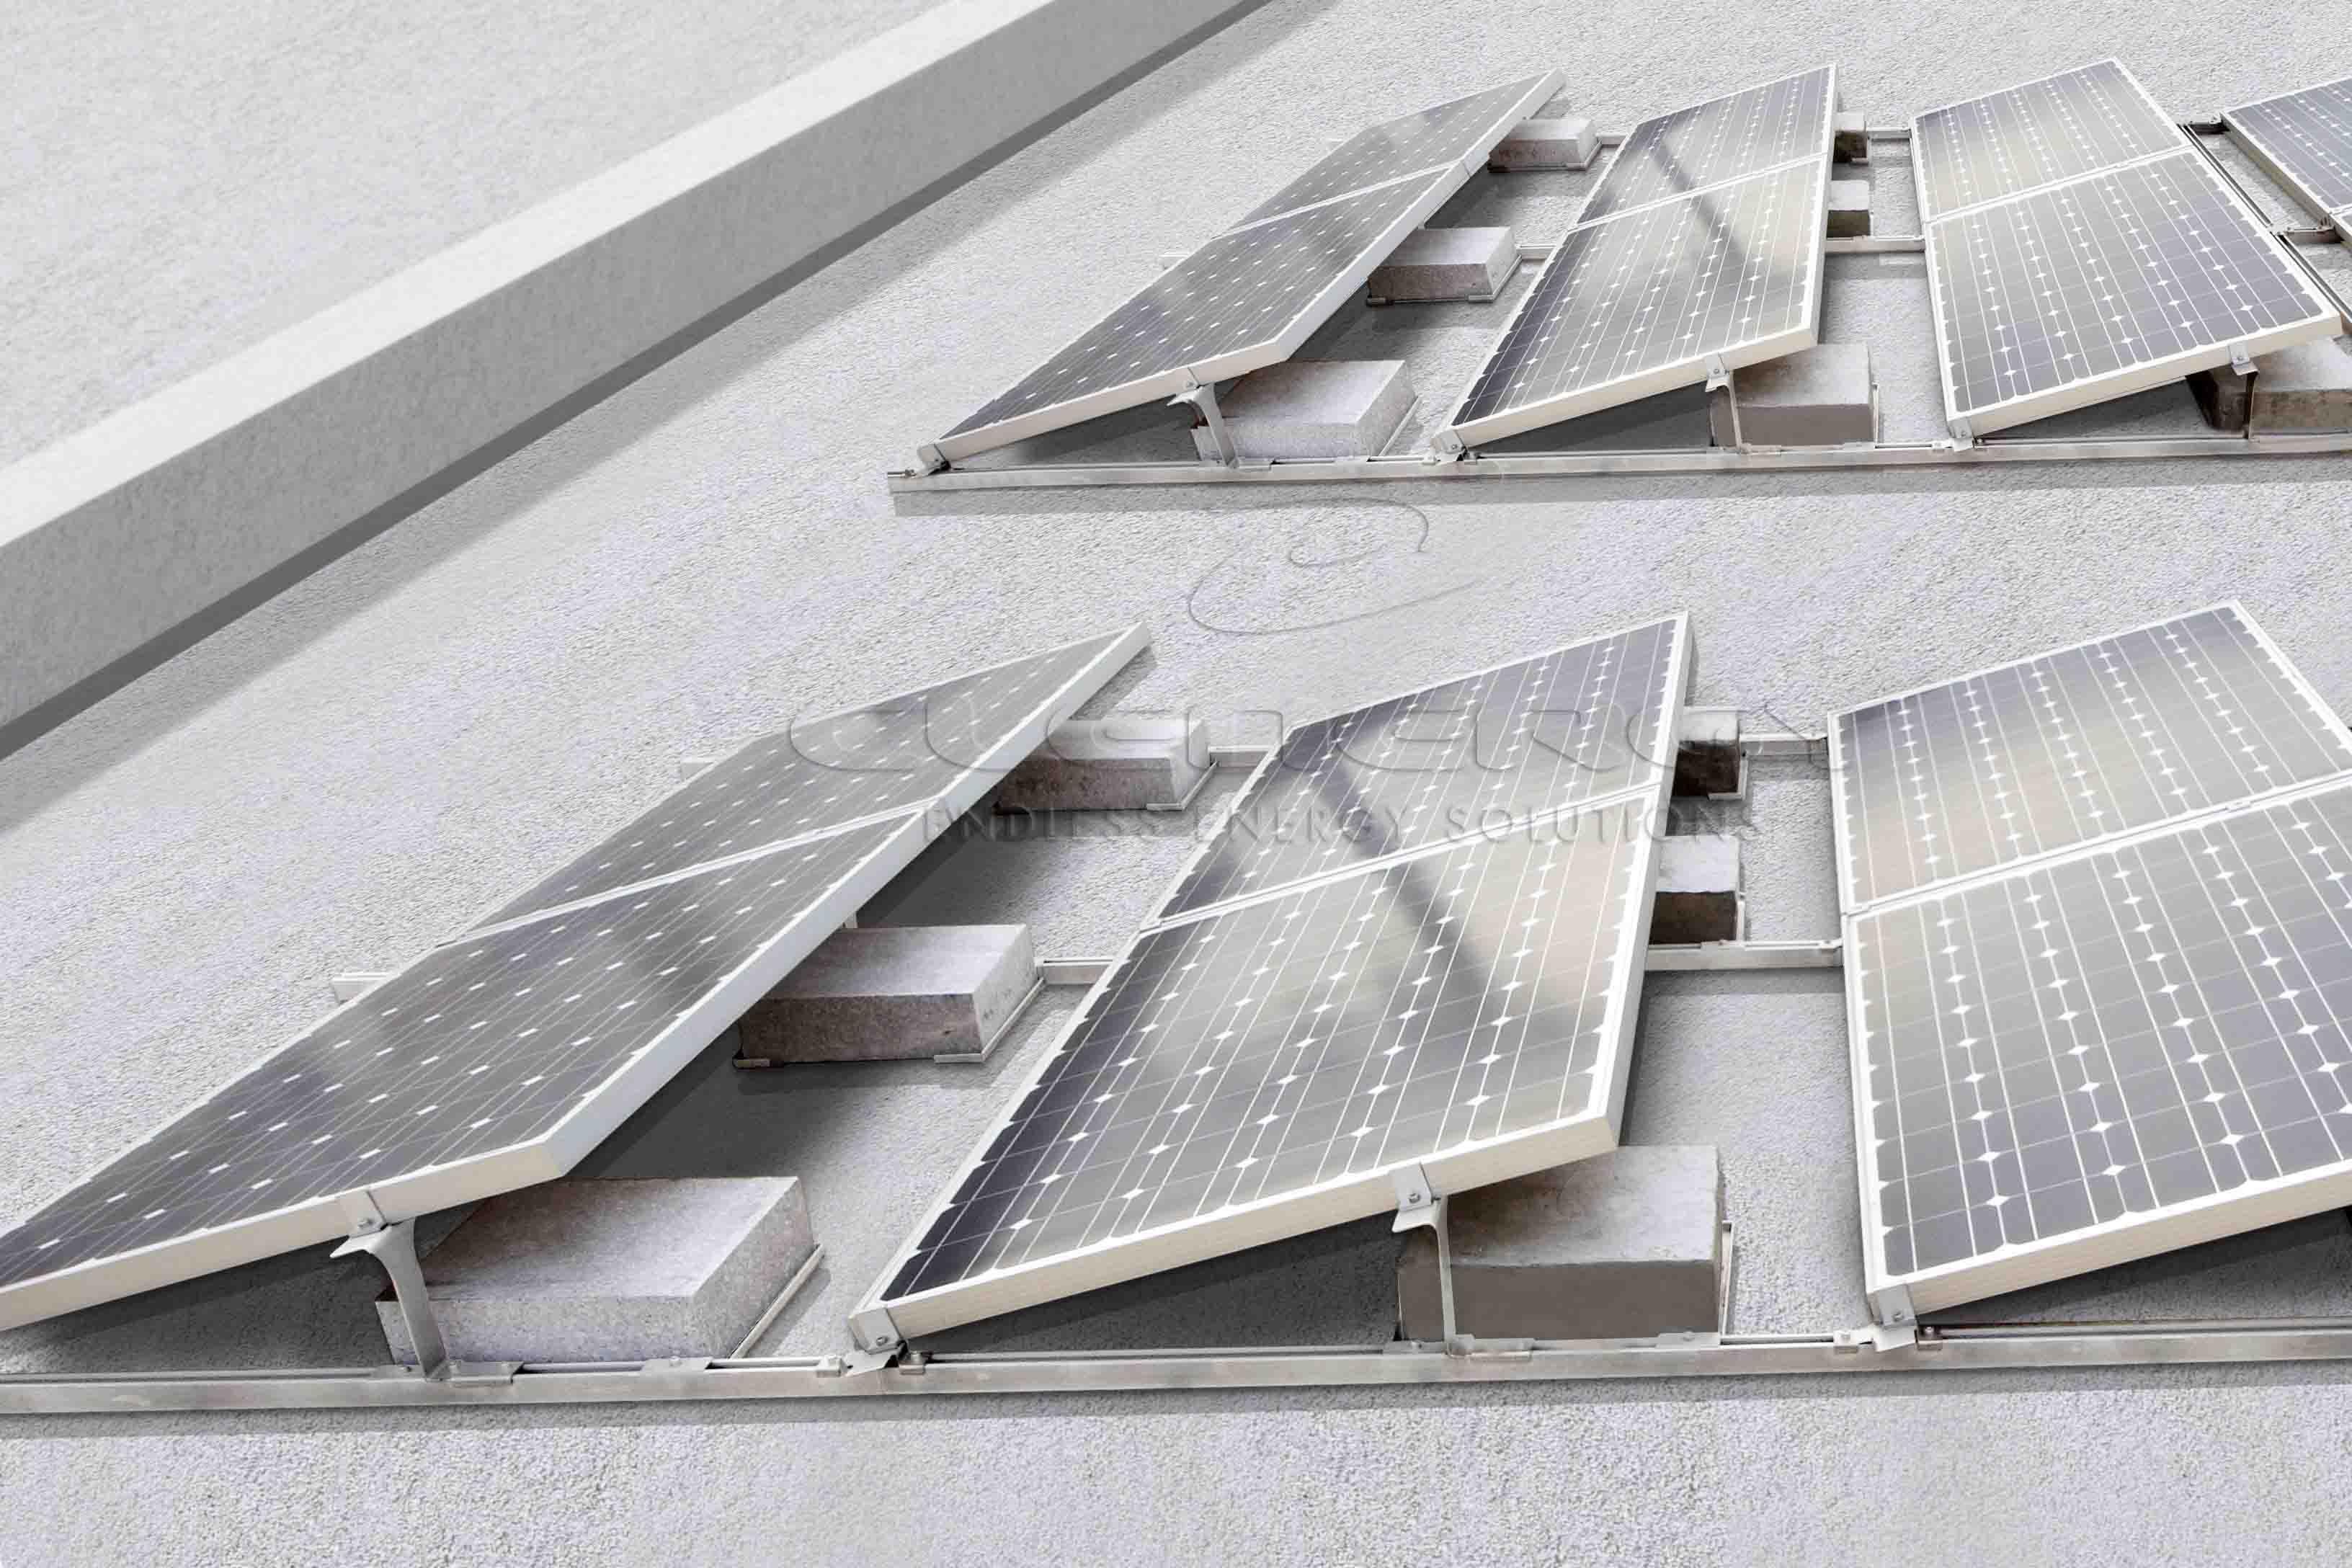 PV-ezRack-SolarMatrix-Flat-Roof-Mounting-System